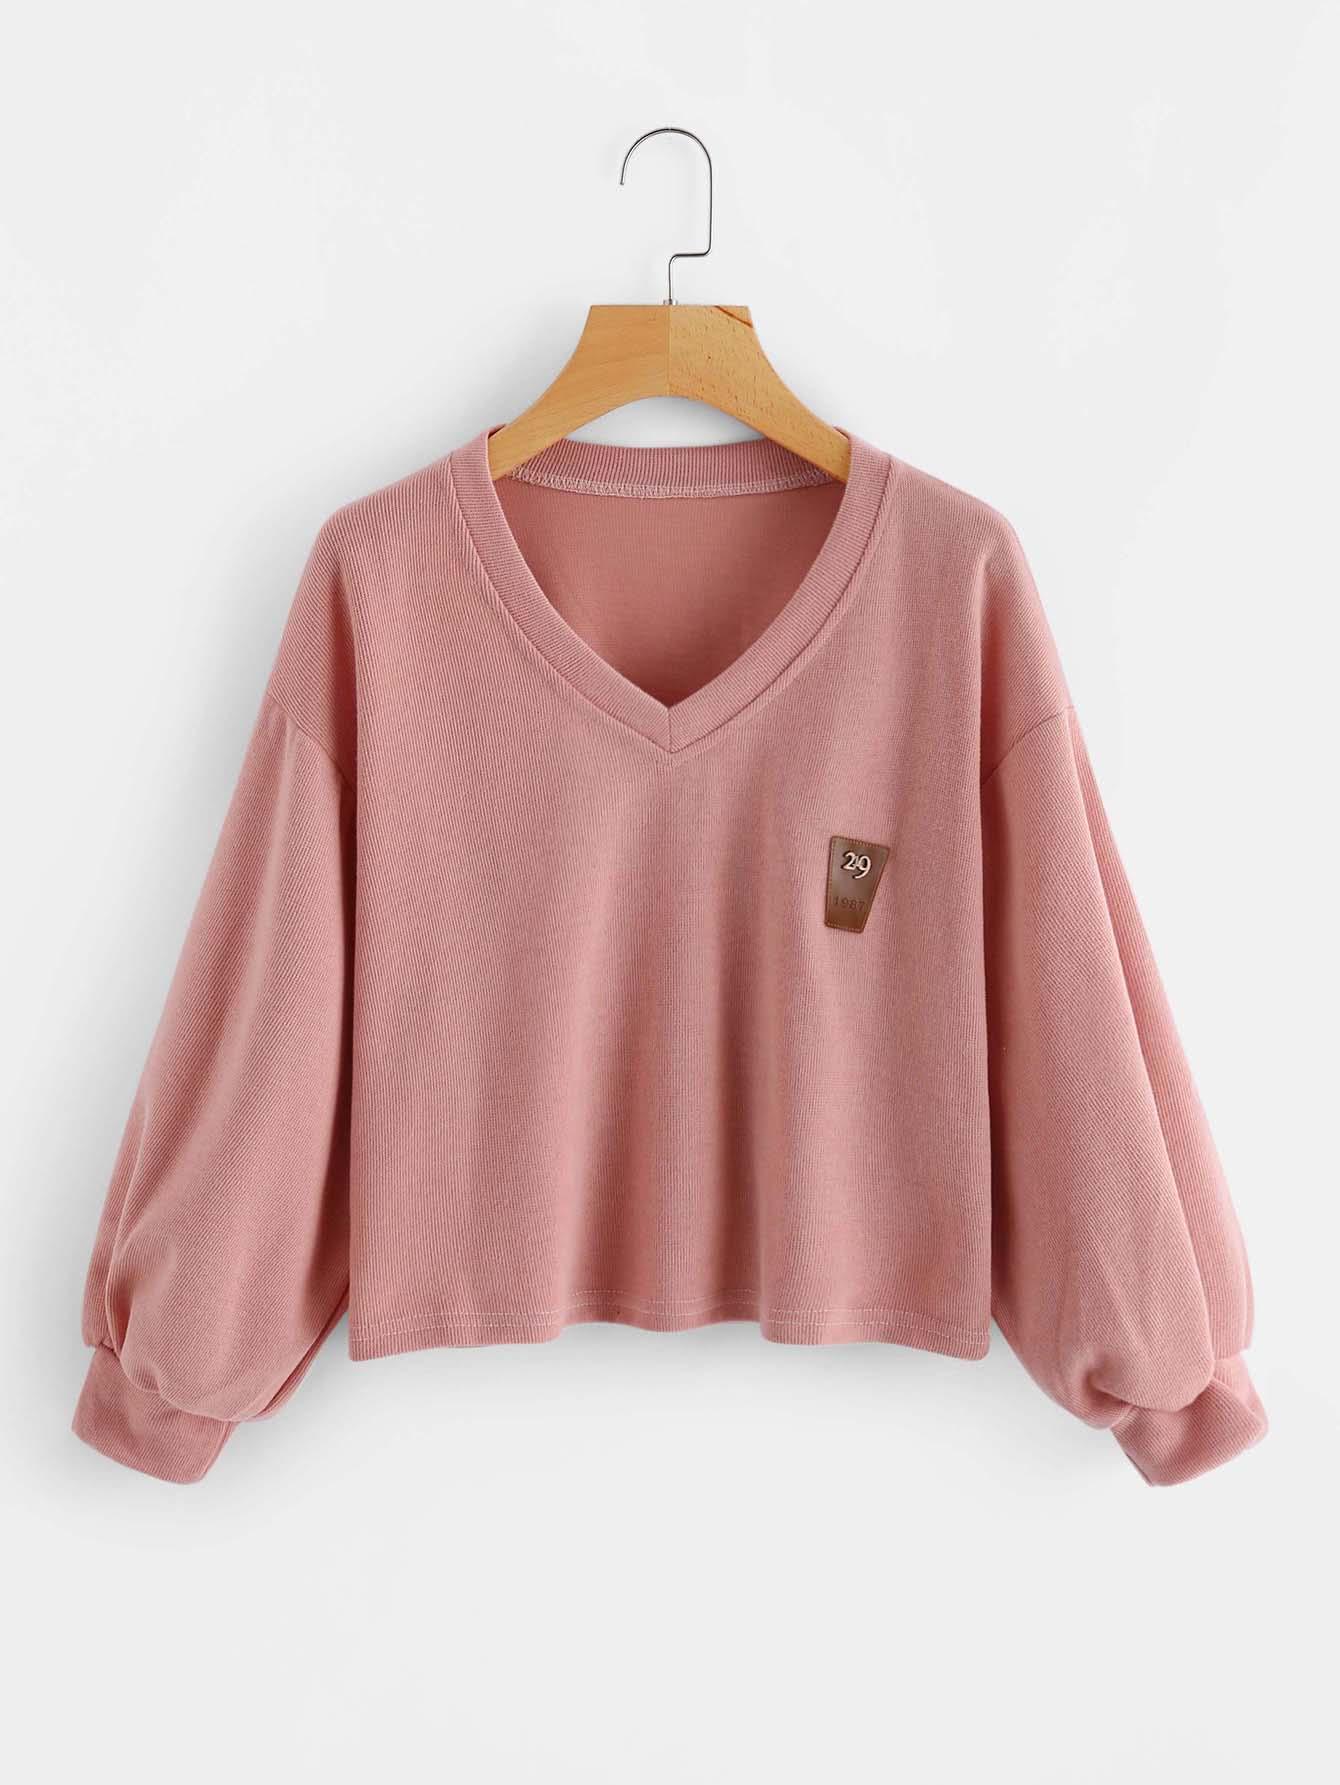 V Neckline Lantern Sleeve Patch Sweatshirt drop shoulder lantern sleeve sweatshirt